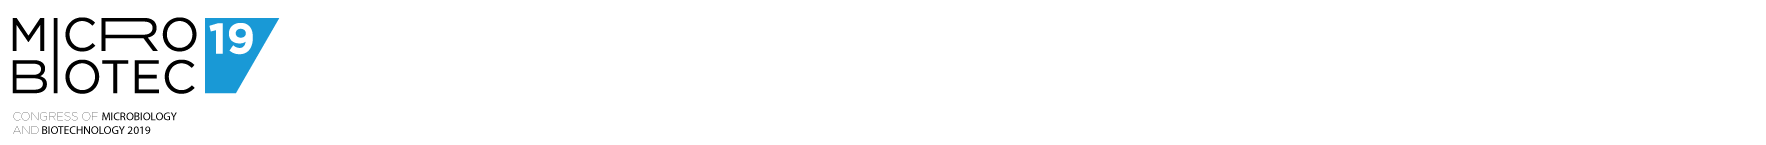 Microbiotec 19